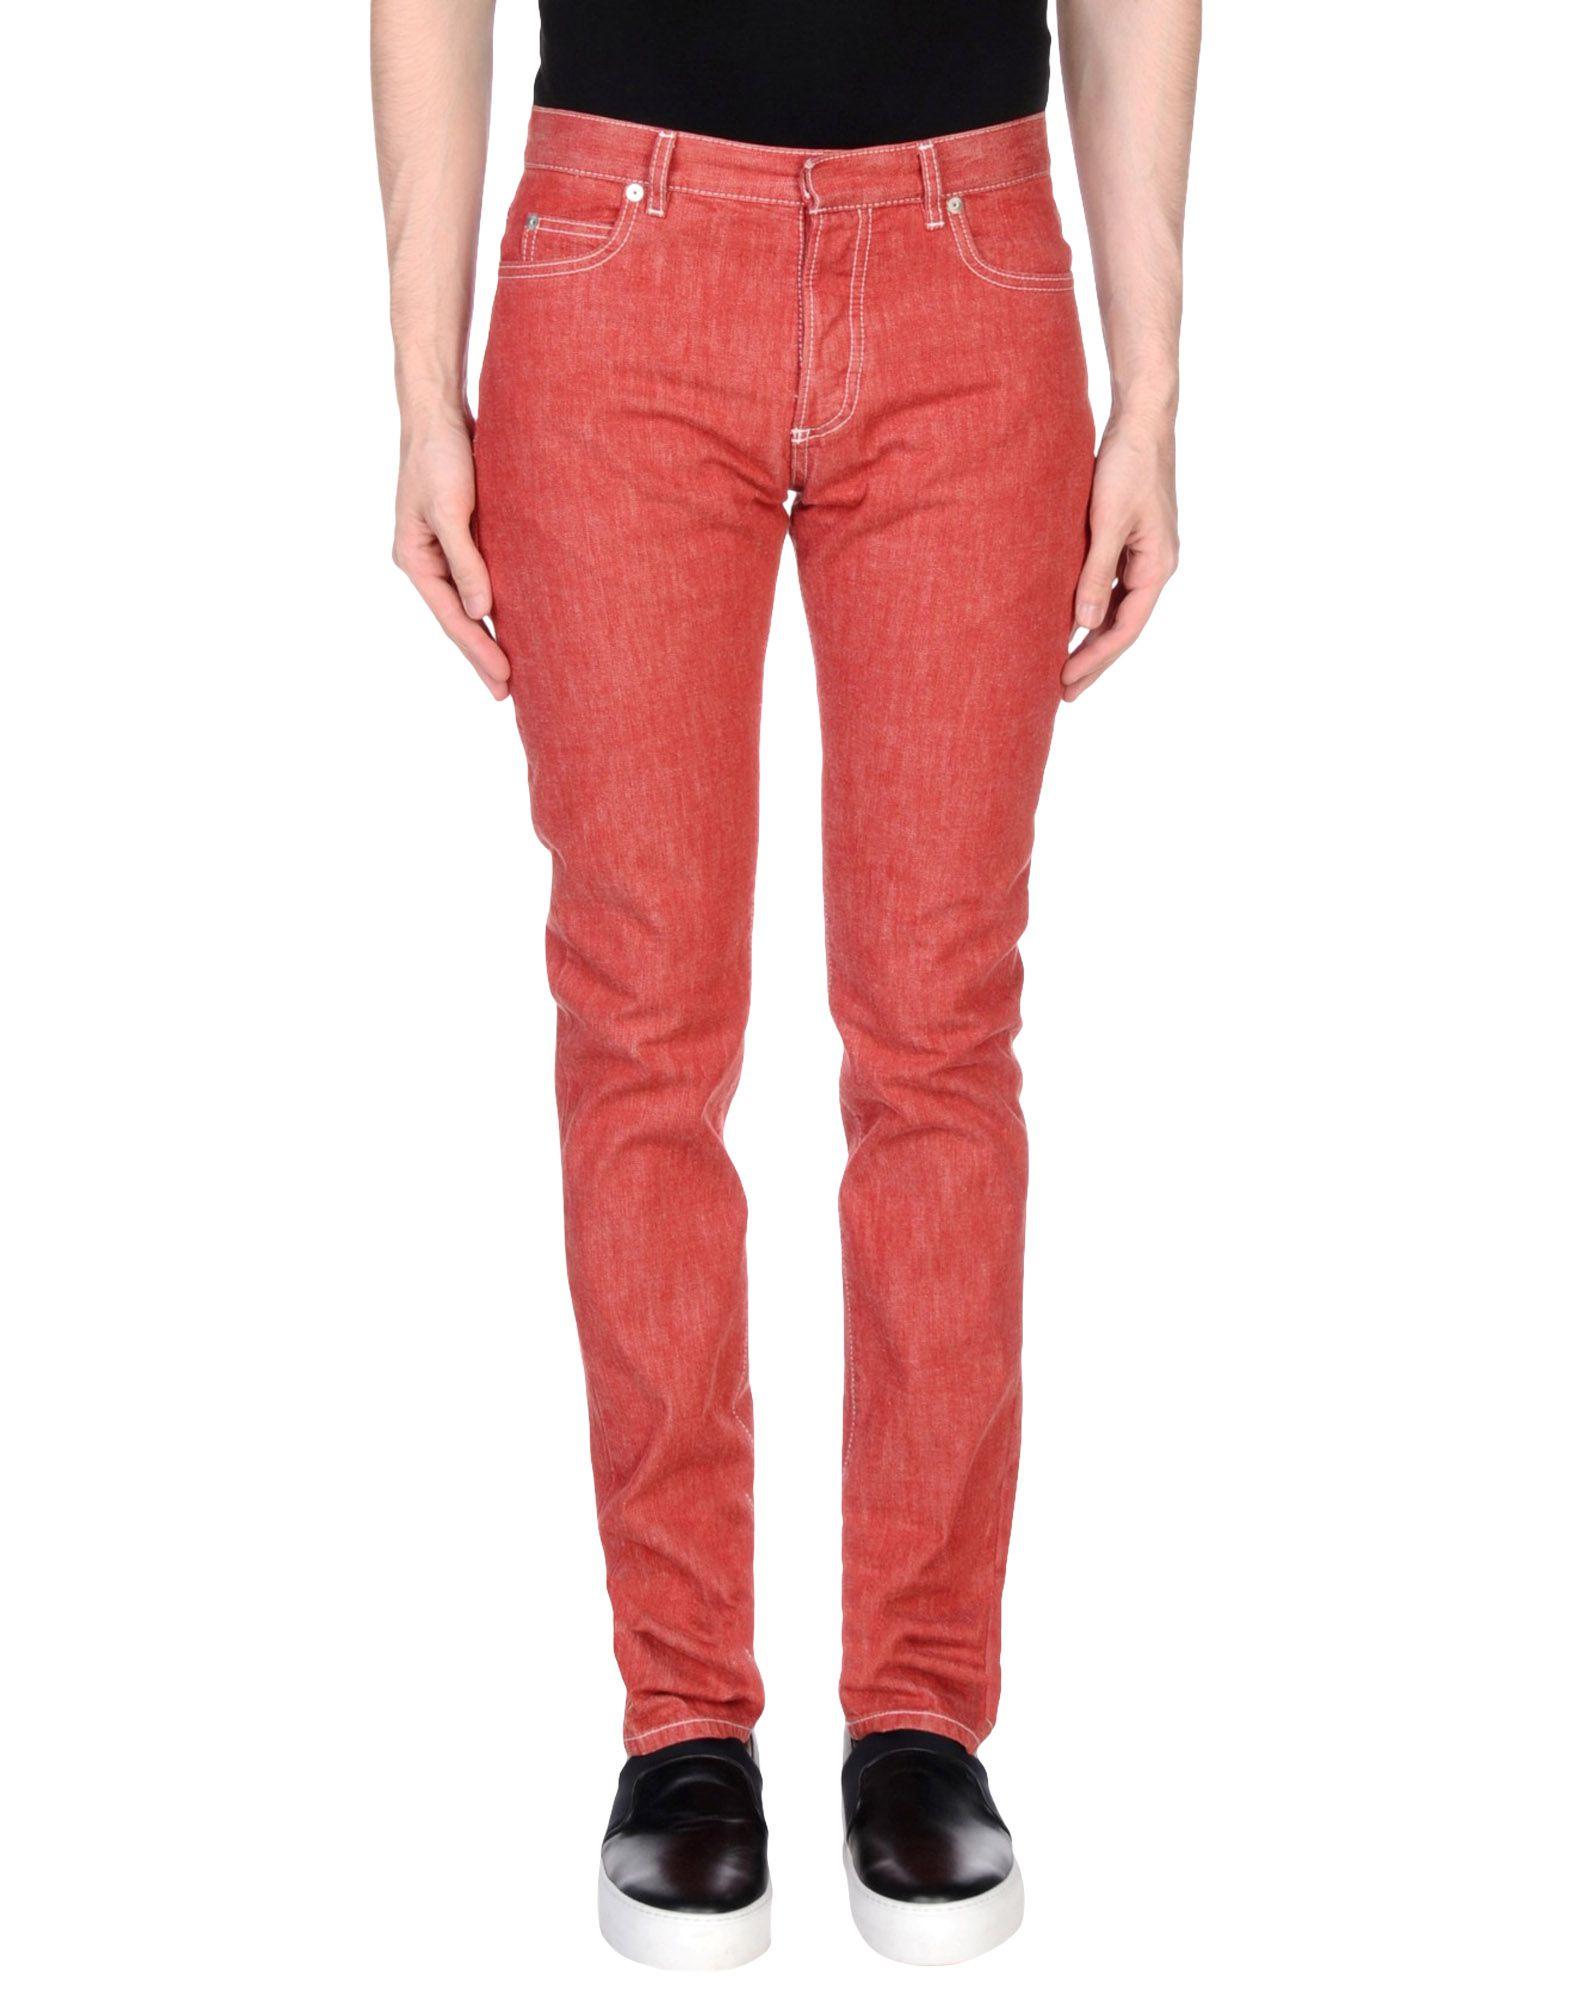 Pantaloni Jeans Maison Margiela Uomo - Acquista online su